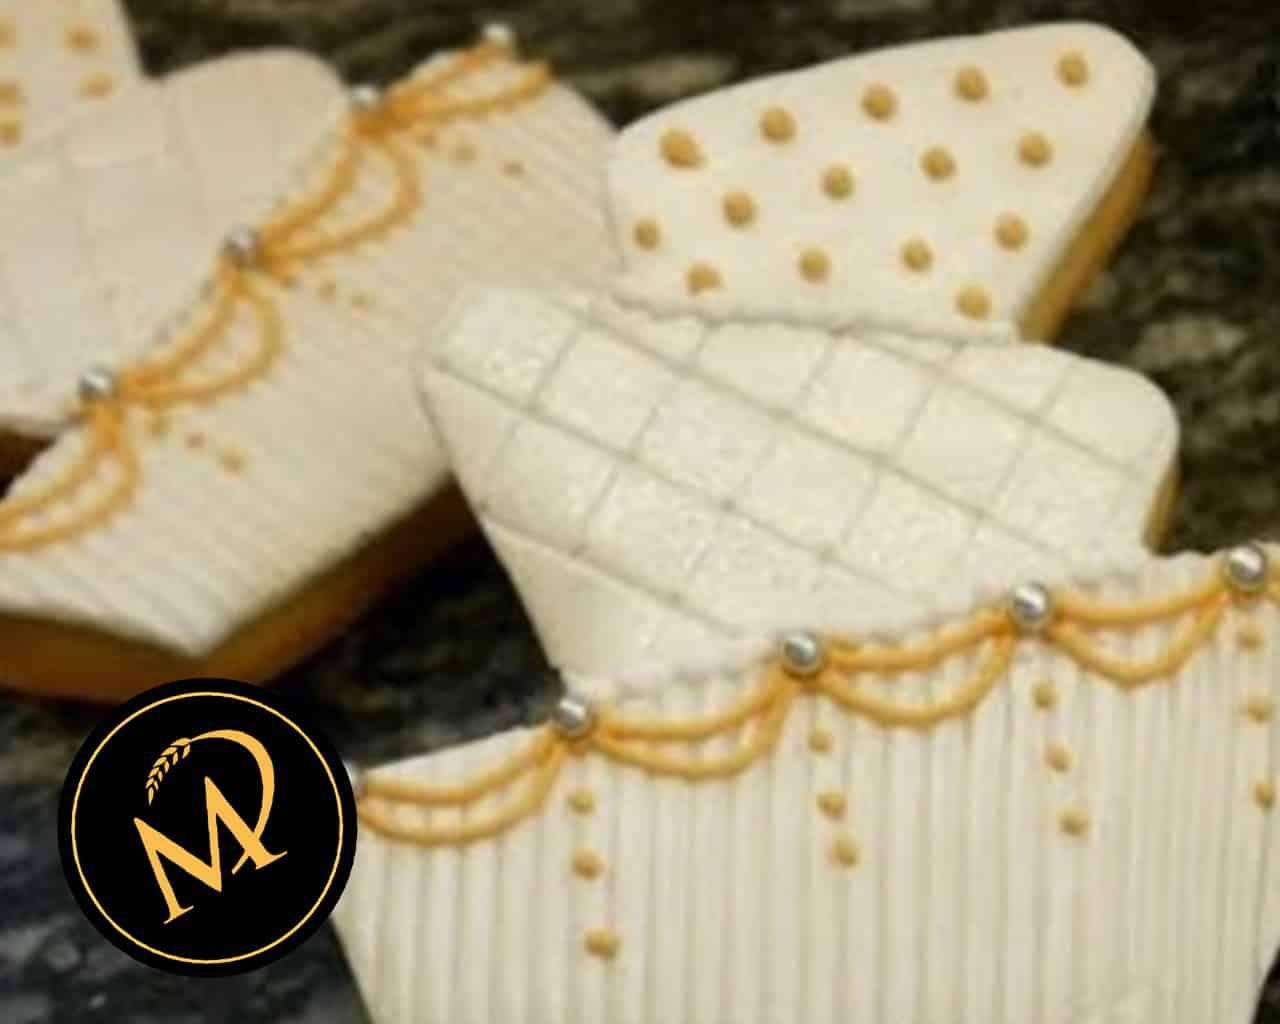 Hochzeits Kekse - Wedding Cake - Rezept Marcel Paa